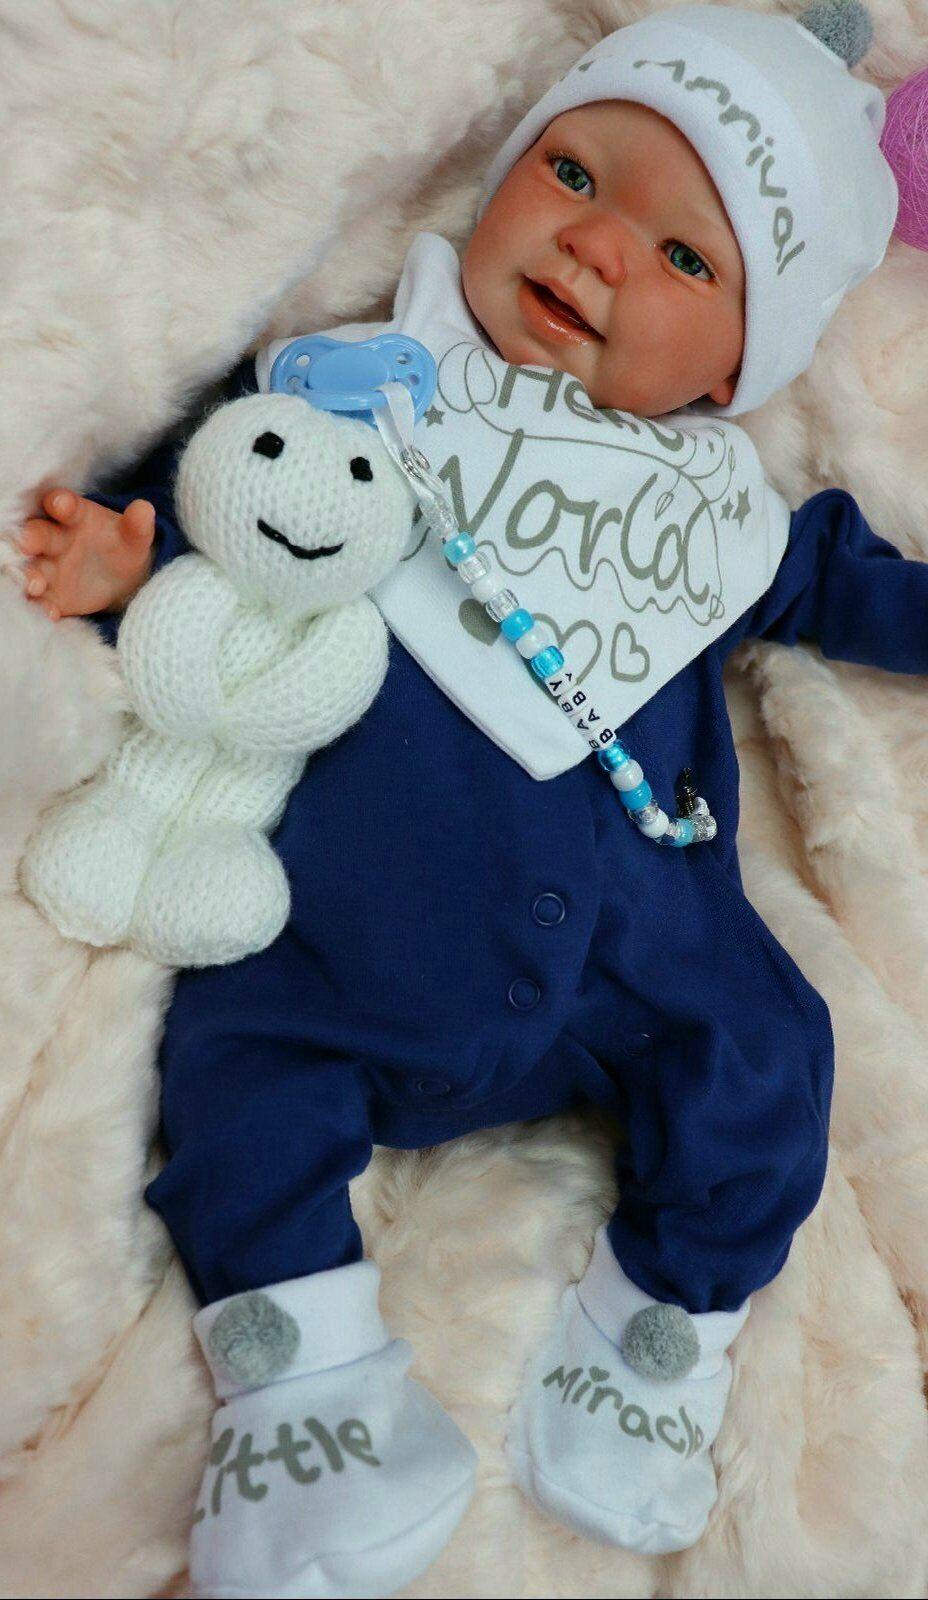 NEW REBORN BLUE EYED BABY BOY DOLL HEAVY CHILD SAFE FULL LIMBS SUNBEAMBABIES DAN